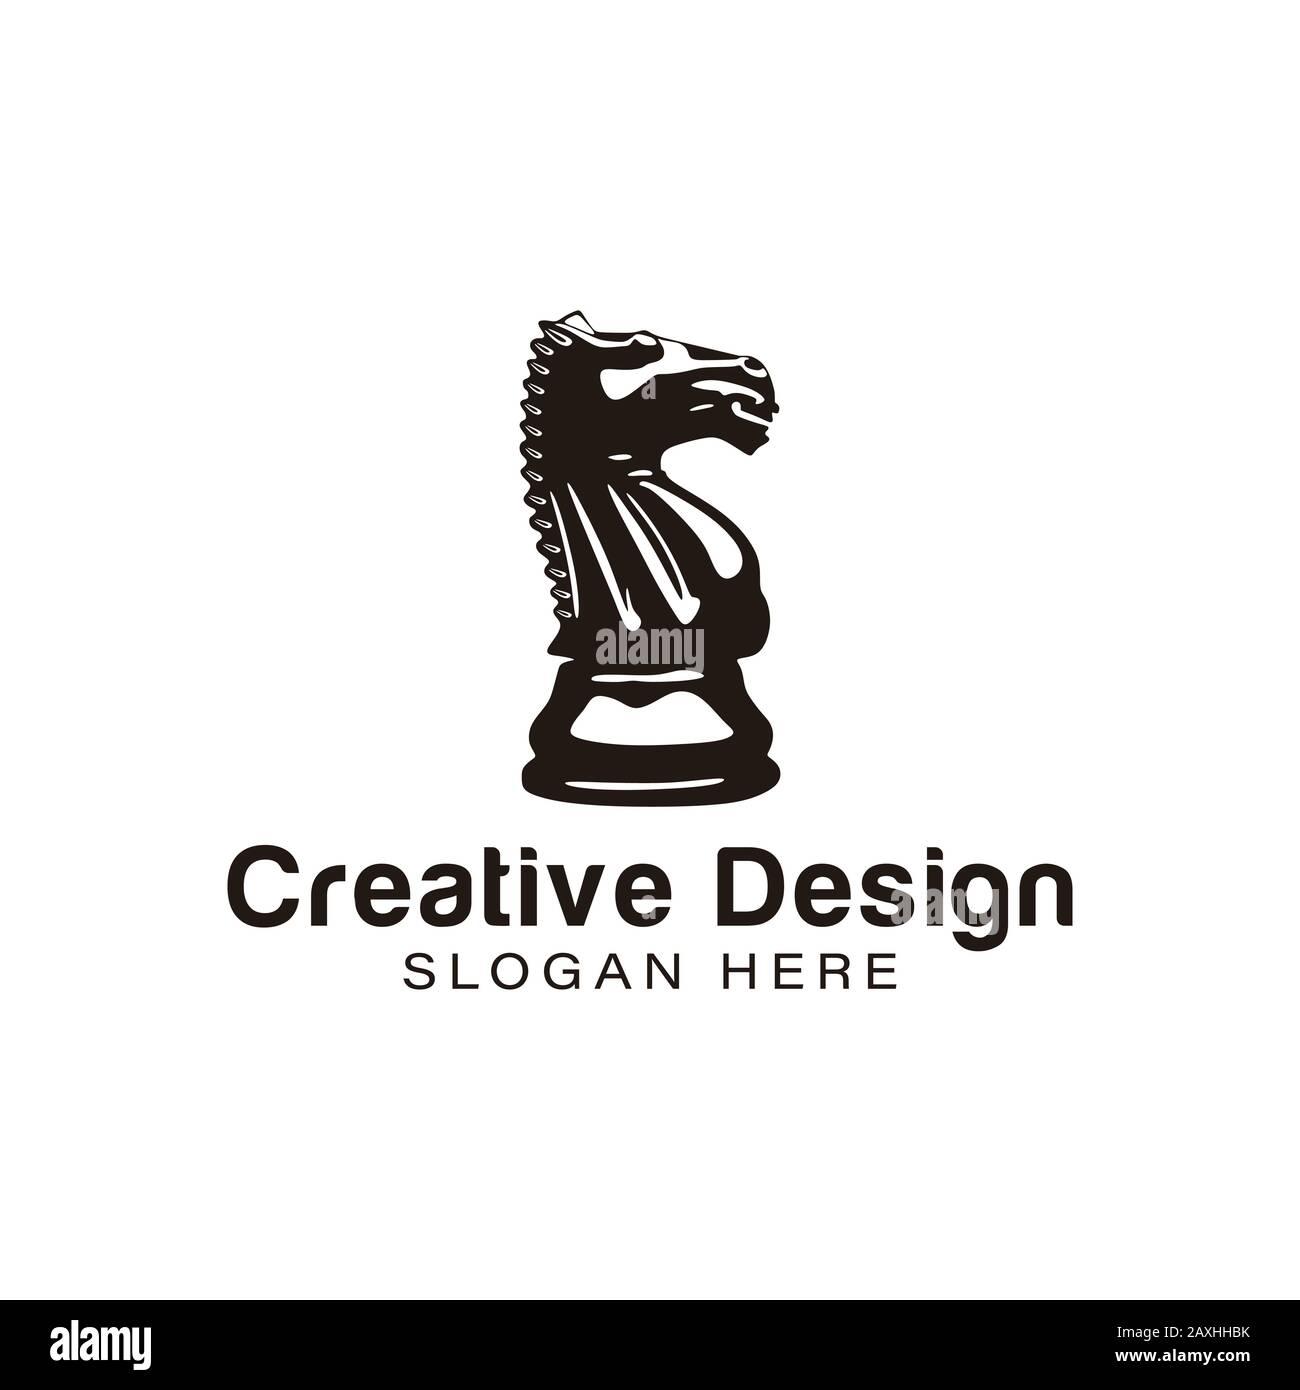 Horse Steer Chess Board Logo Ideas Inspiration Logo Design Template Vector Illustration Isolated On White Background Stock Vector Image Art Alamy